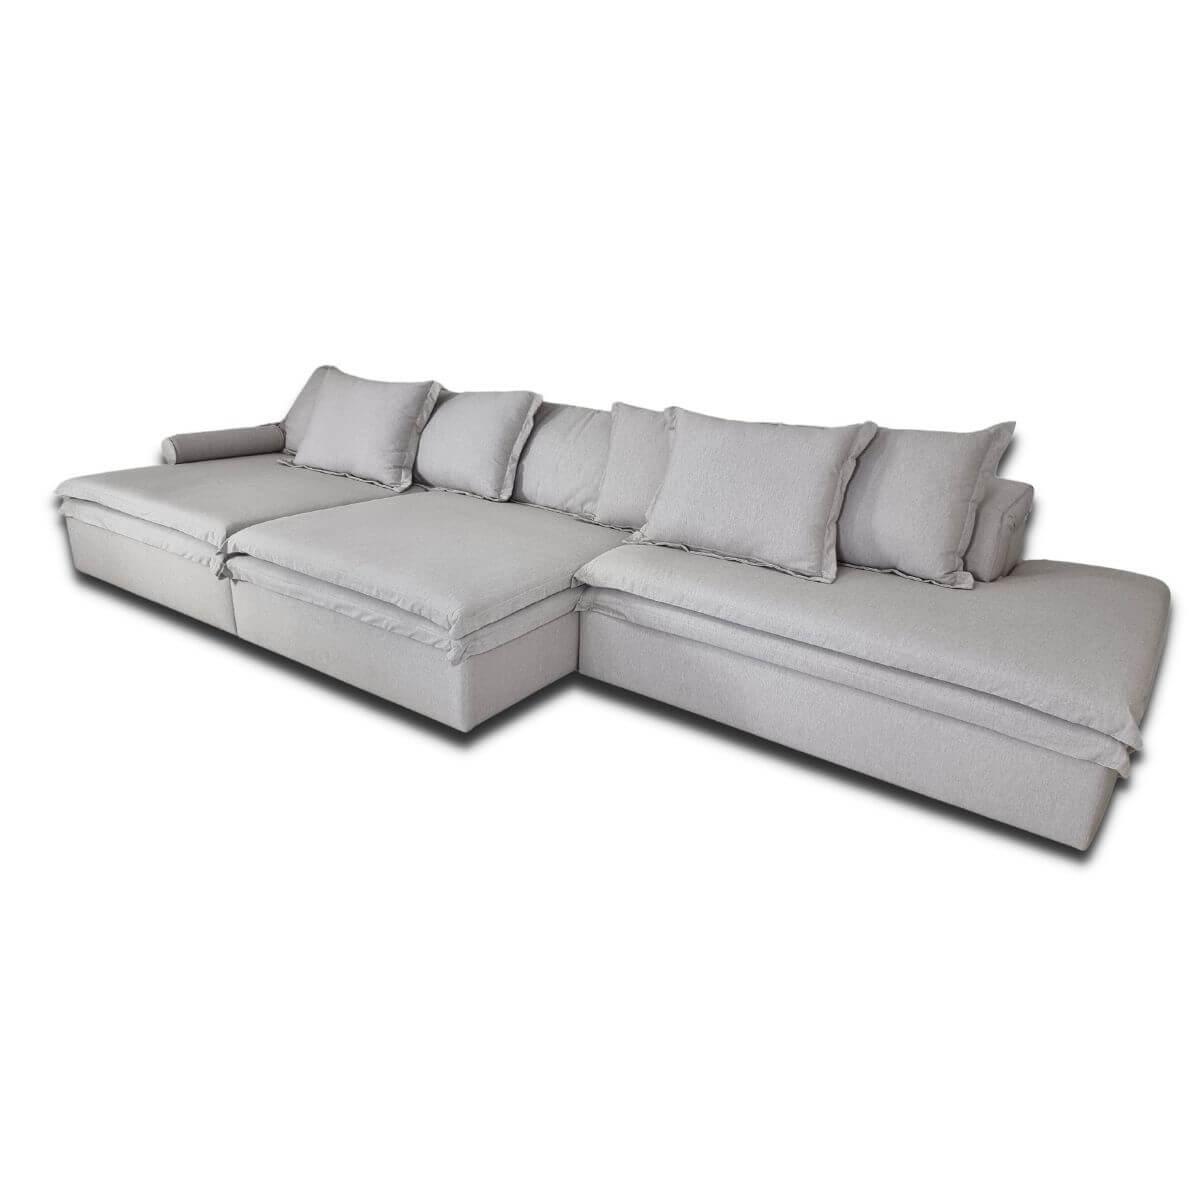 Sofá Retrátil e Reclinável 420cm Molli - Peça Única